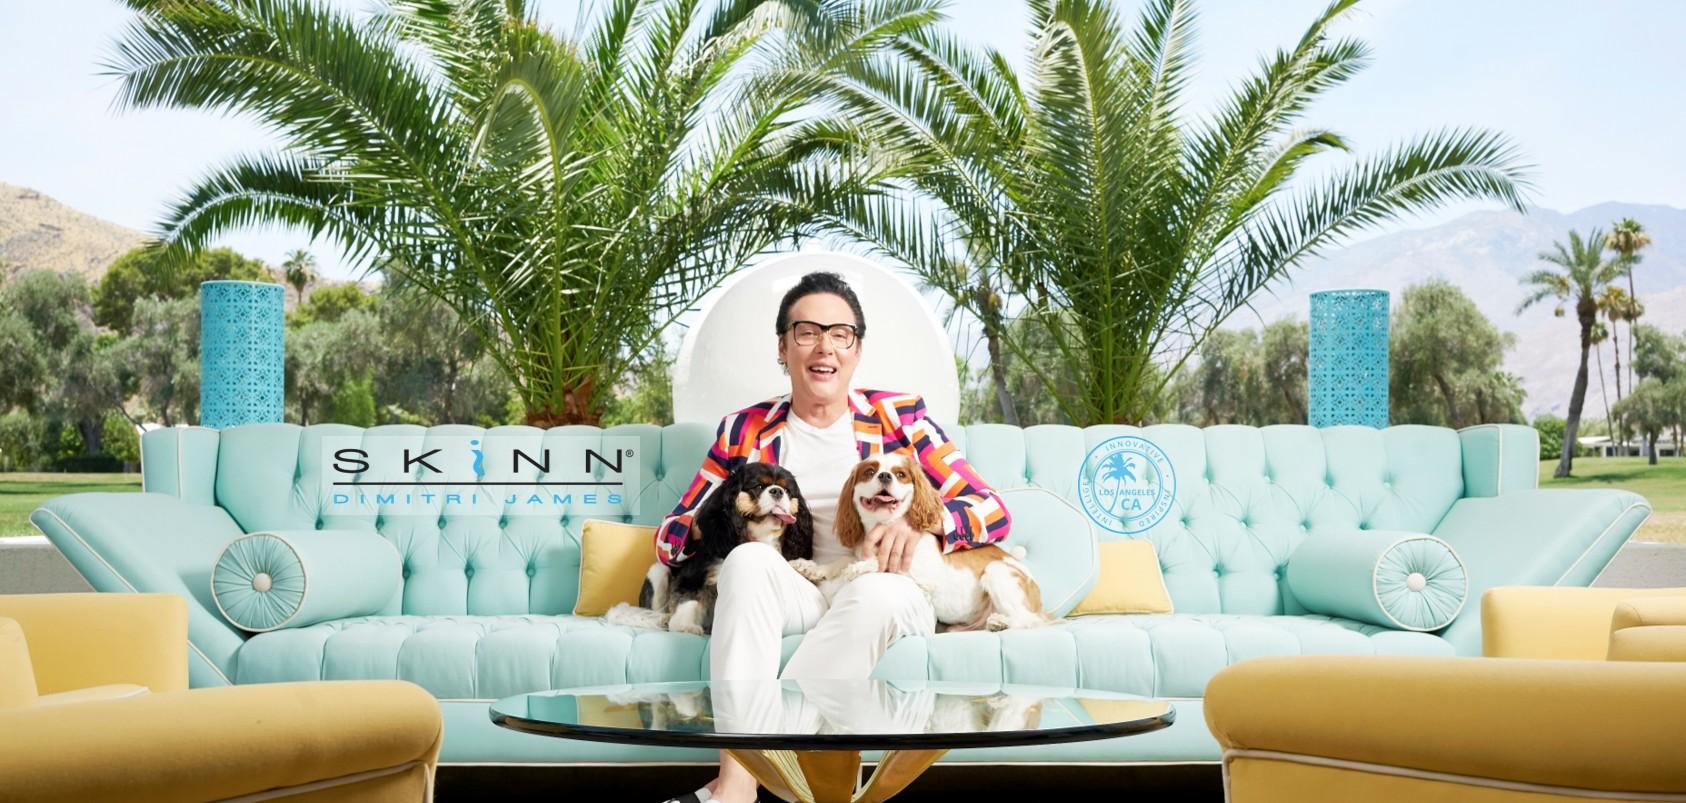 SKINN Cosmetics | LinkedIn